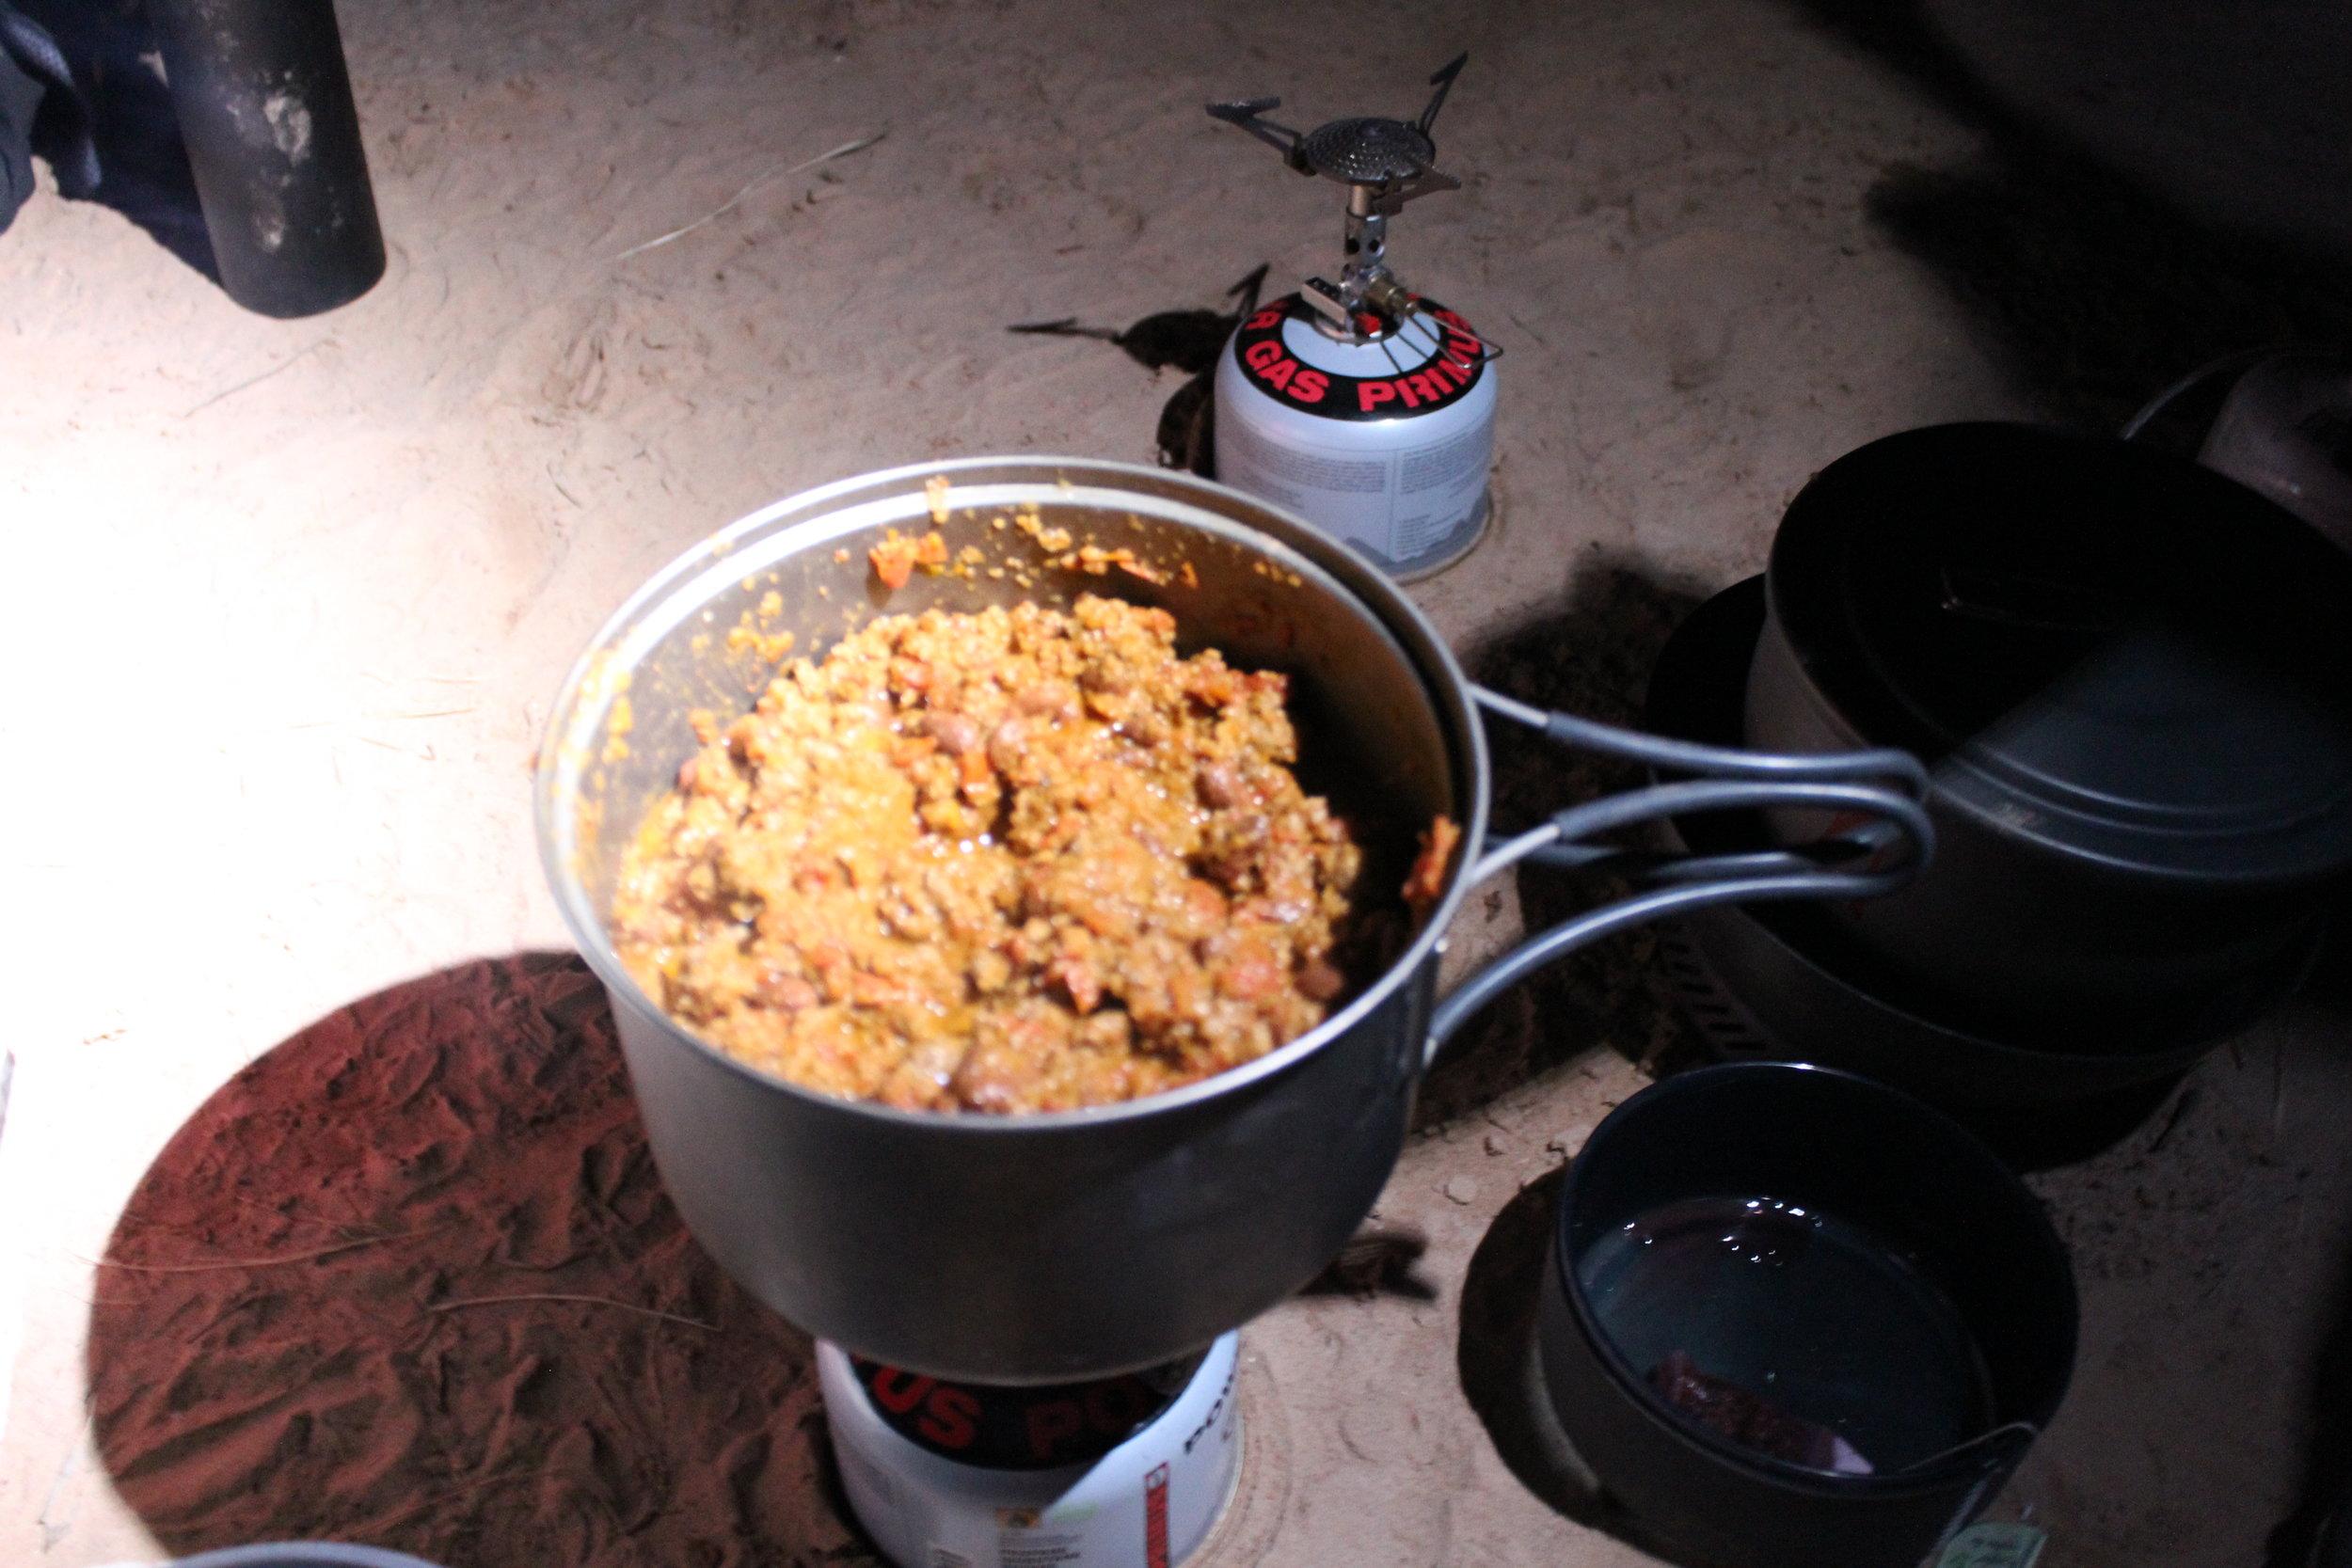 Homemade chili for dinner.  Yum.